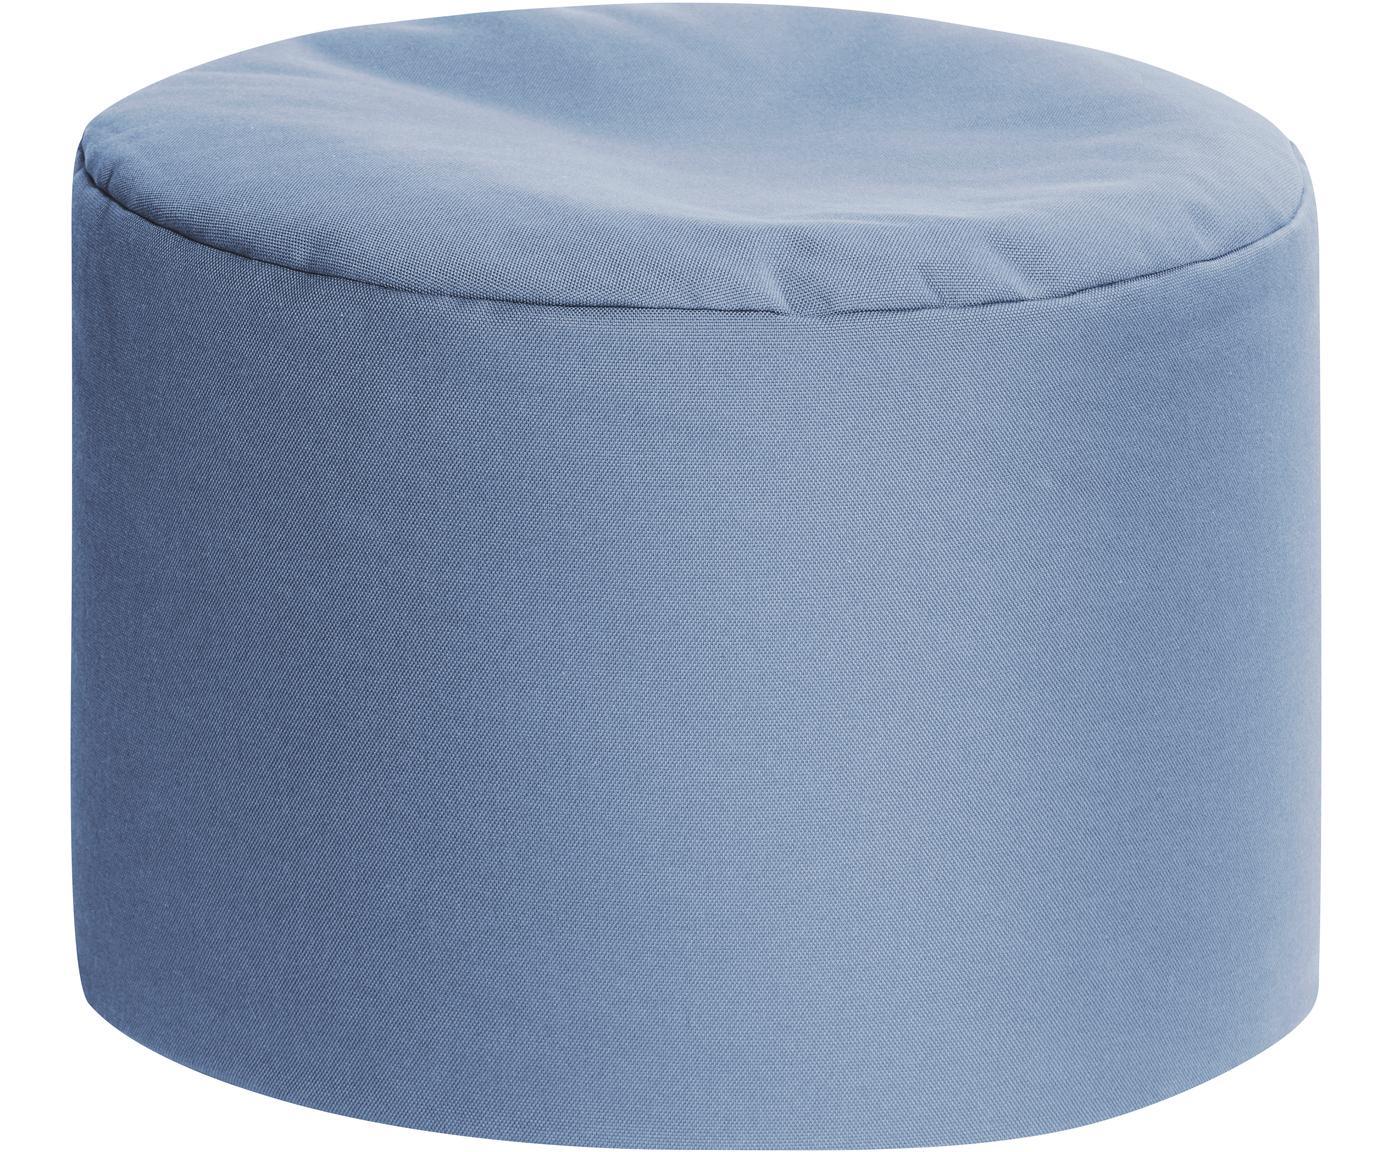 In- & Outdoor-Sitzsack Dotcom, Bezug: 100% Polyacryl Dralon (ga, Blau, Ø 60 x H 40 cm